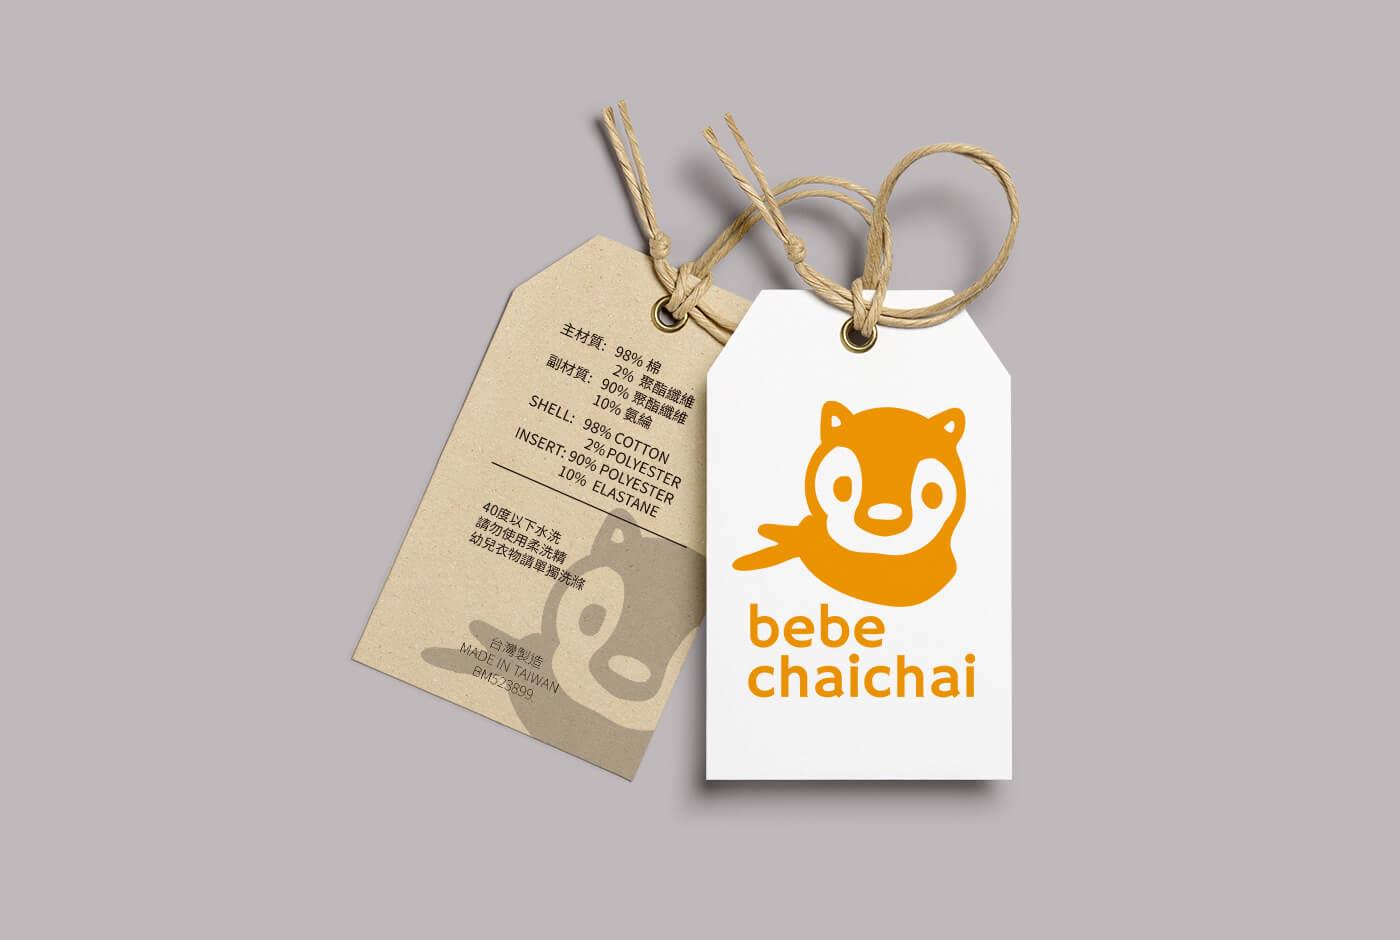 bebechai-tag